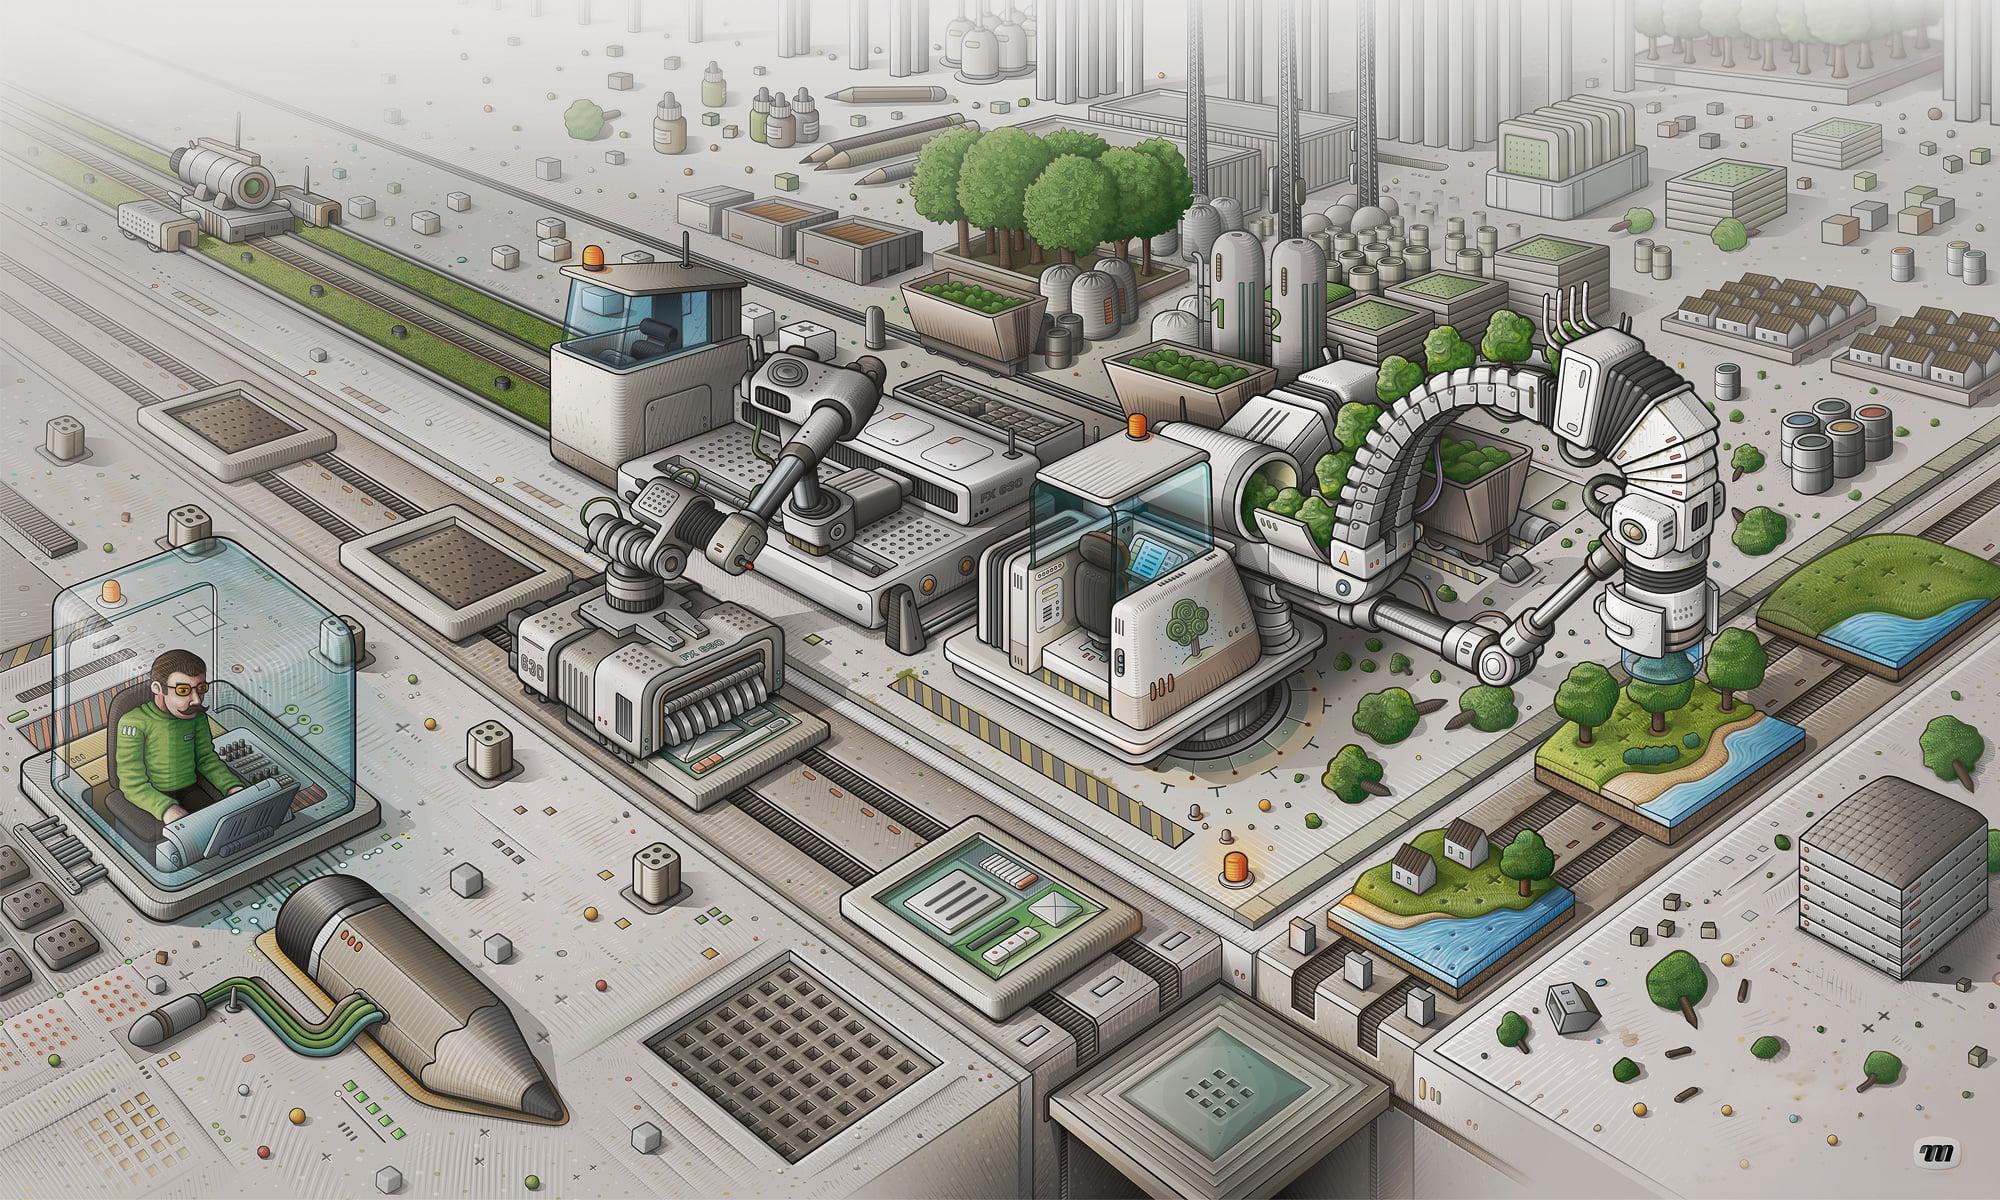 Illustration Mi Factory - image Illustration-vectorielle-MI-factory on https://www.philippe-mignotte.fr